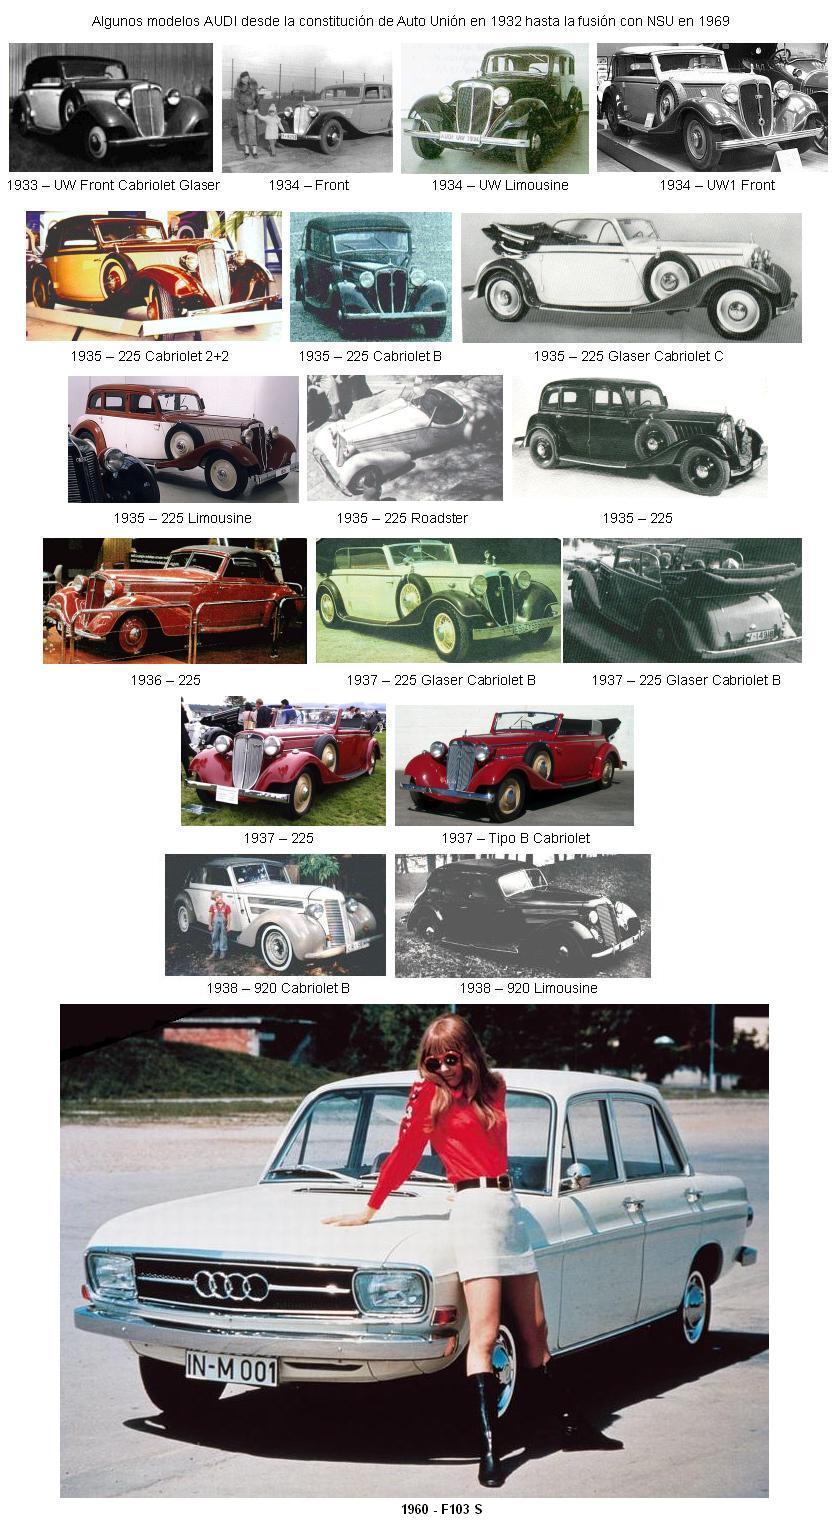 Historia de Audi AUDI-02-Auto%20Union%20%281932-1968%29